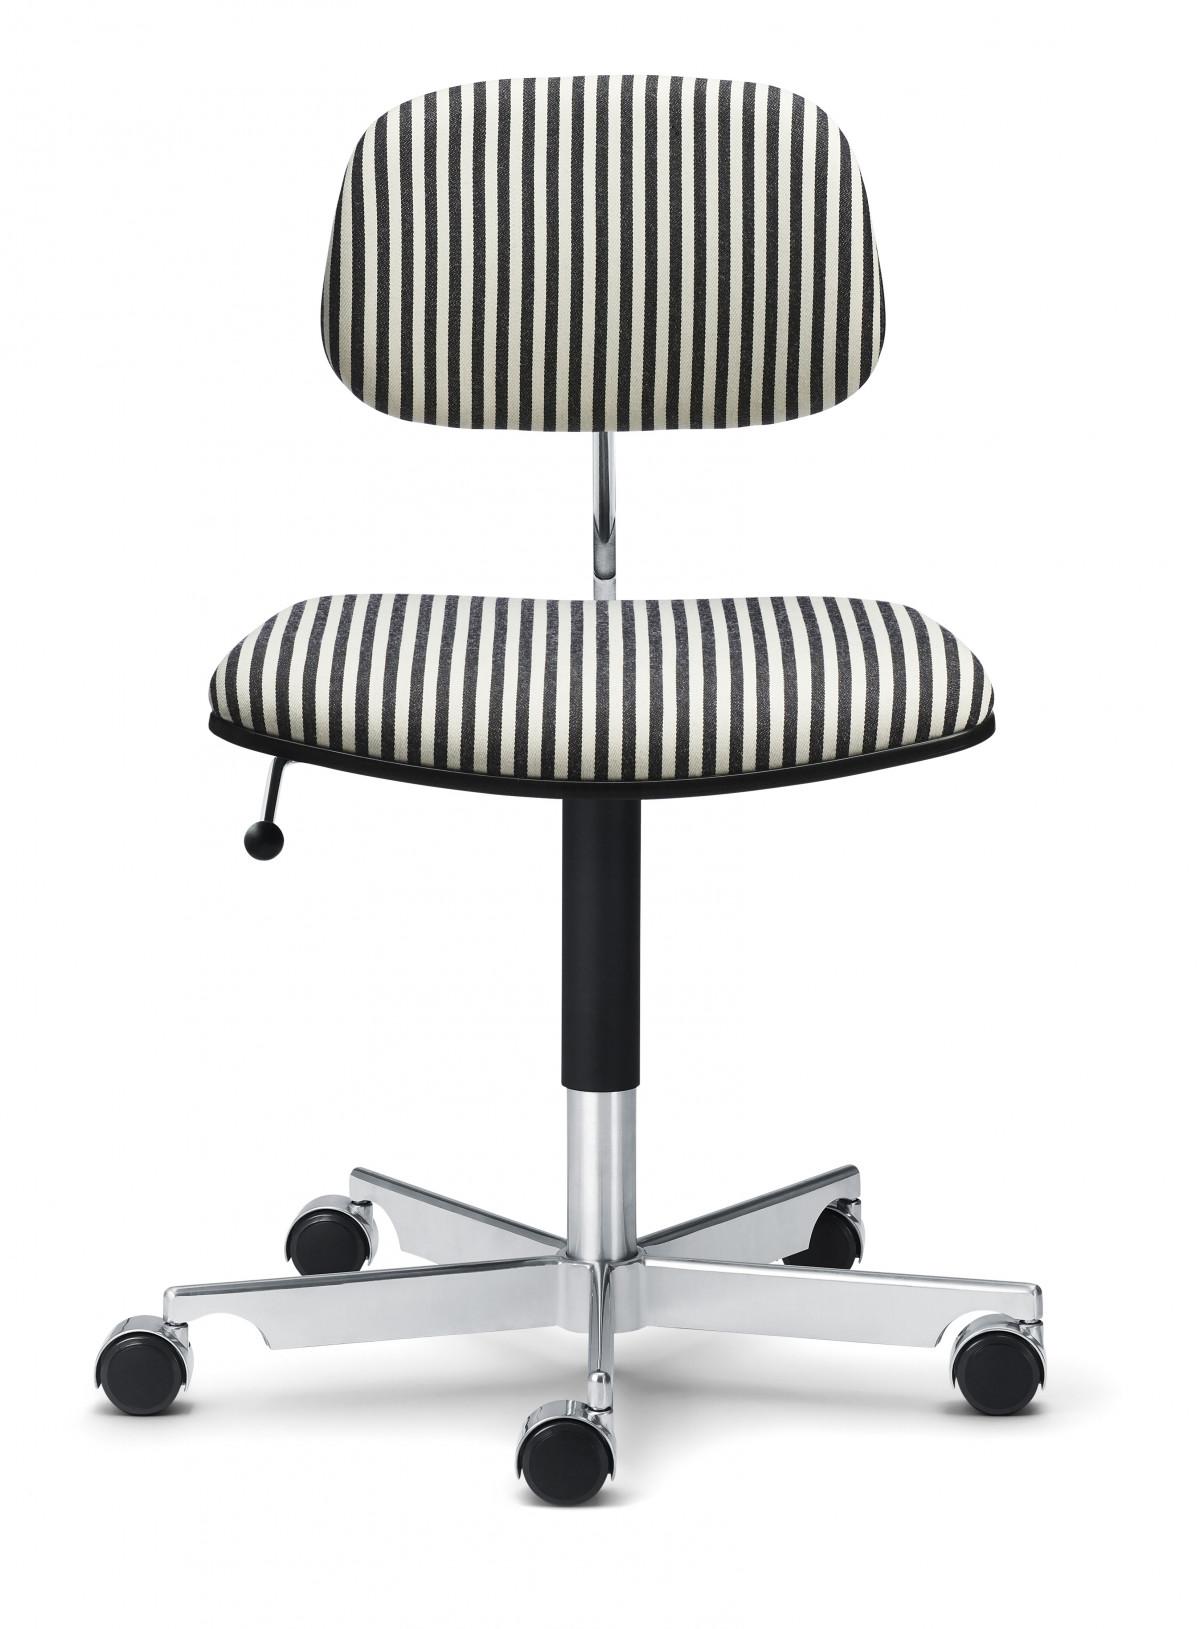 Construct stool group(1).jpg